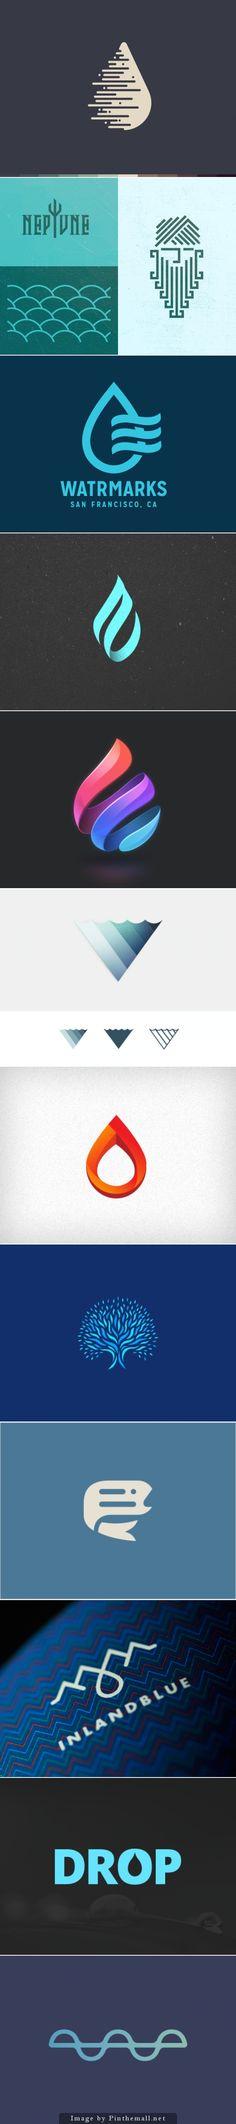 Beautiful Water Inspired Logos